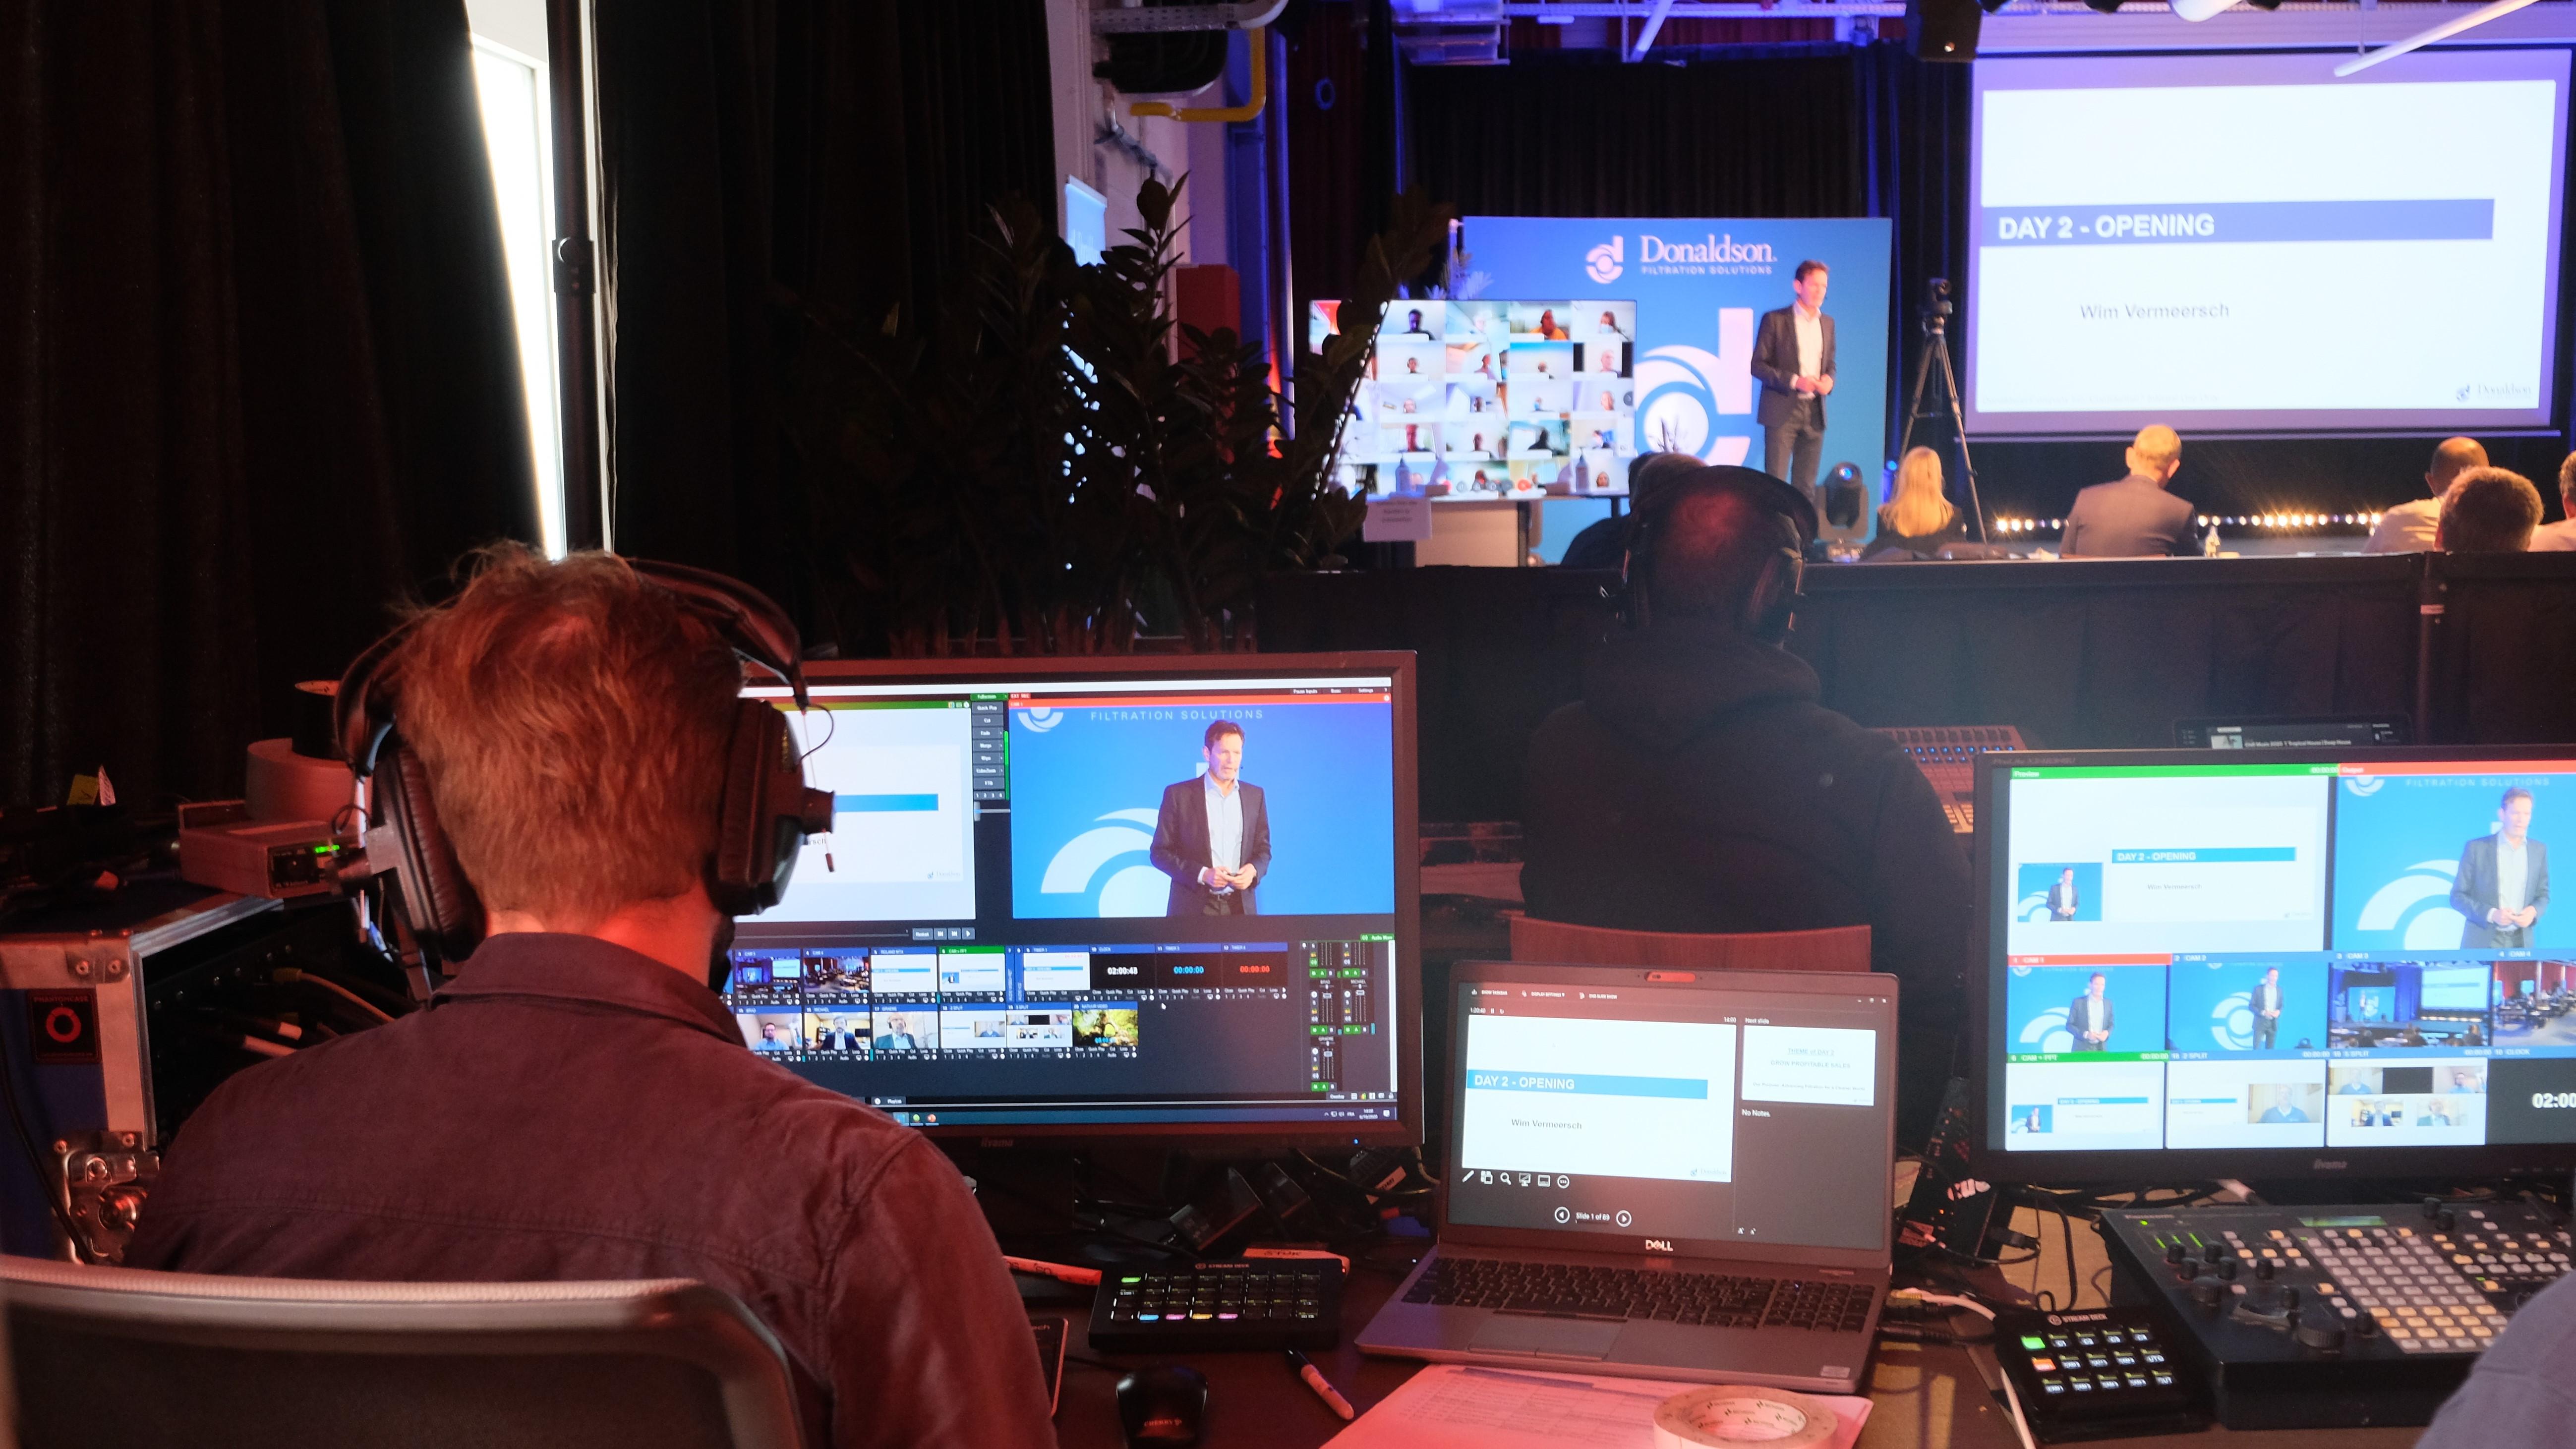 Donaldson - Leadership Summit 05-06.10.2